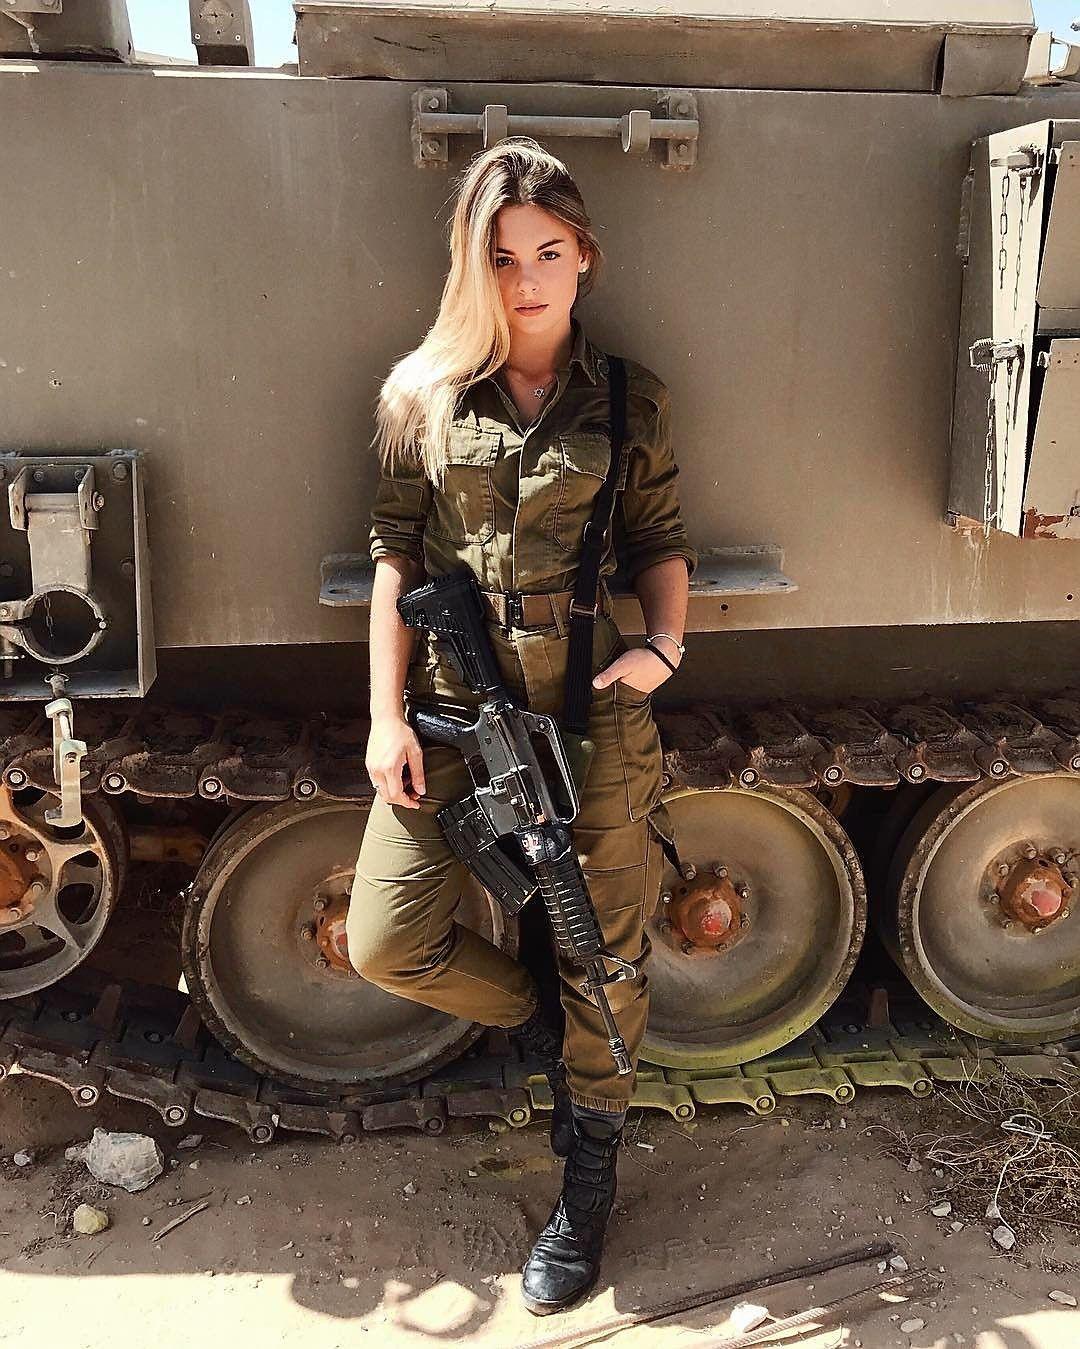 IDF - Israel Defense Forces - Women | Military girl, Army